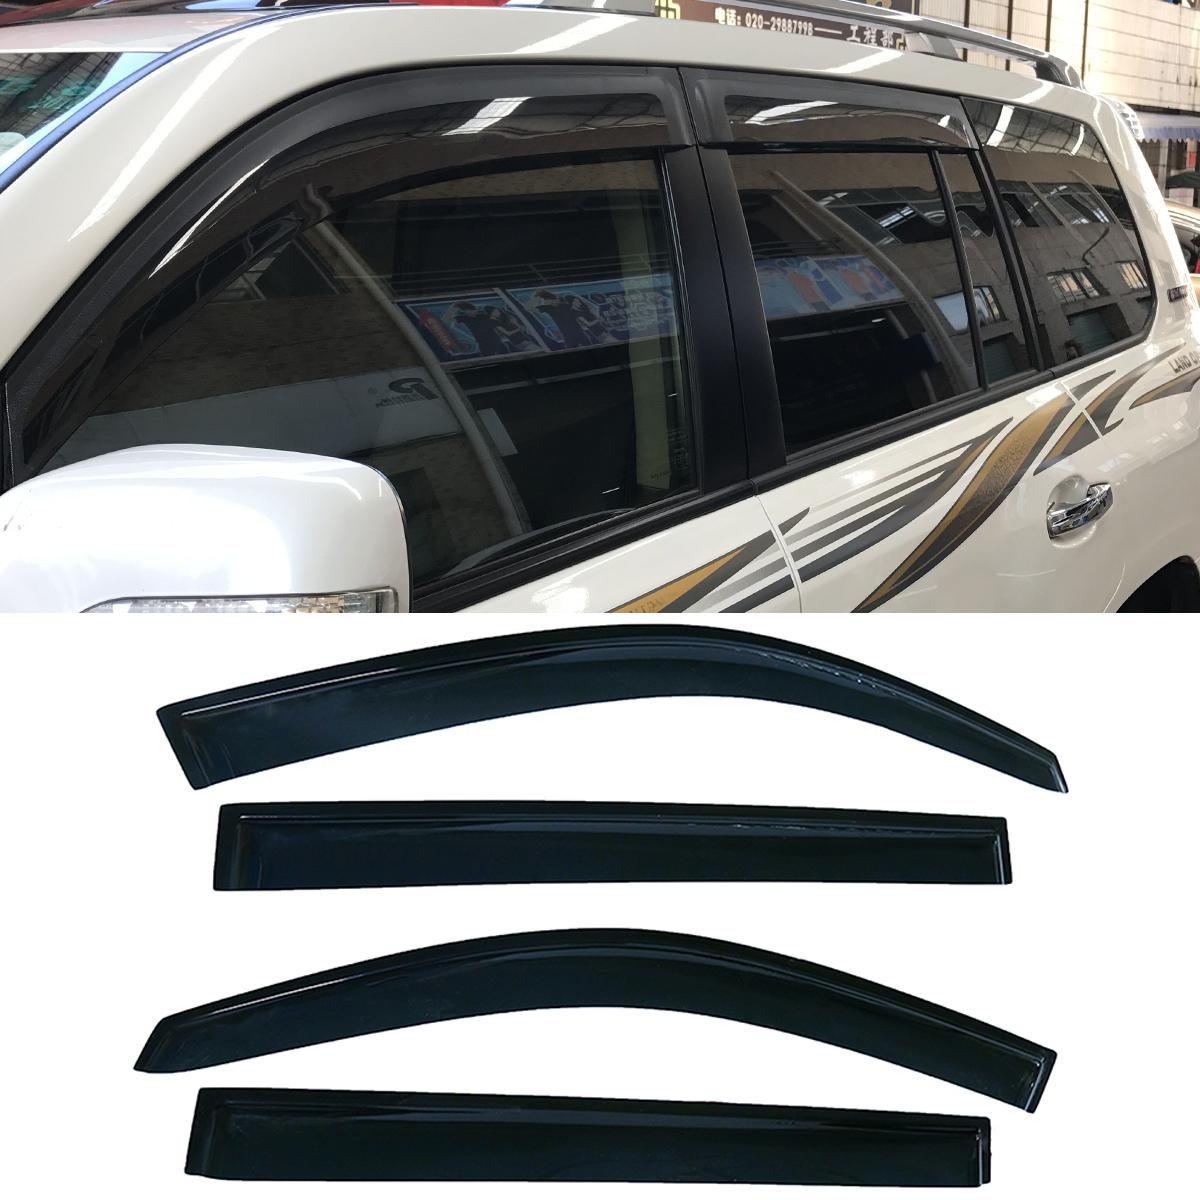 Car & Truck Parts fit 2008-2013 Highlander Window Visor Sun Shade Vent Rain Guard Wind Deflector Car & Truck Sunroofs, Hard Tops & Soft Tops